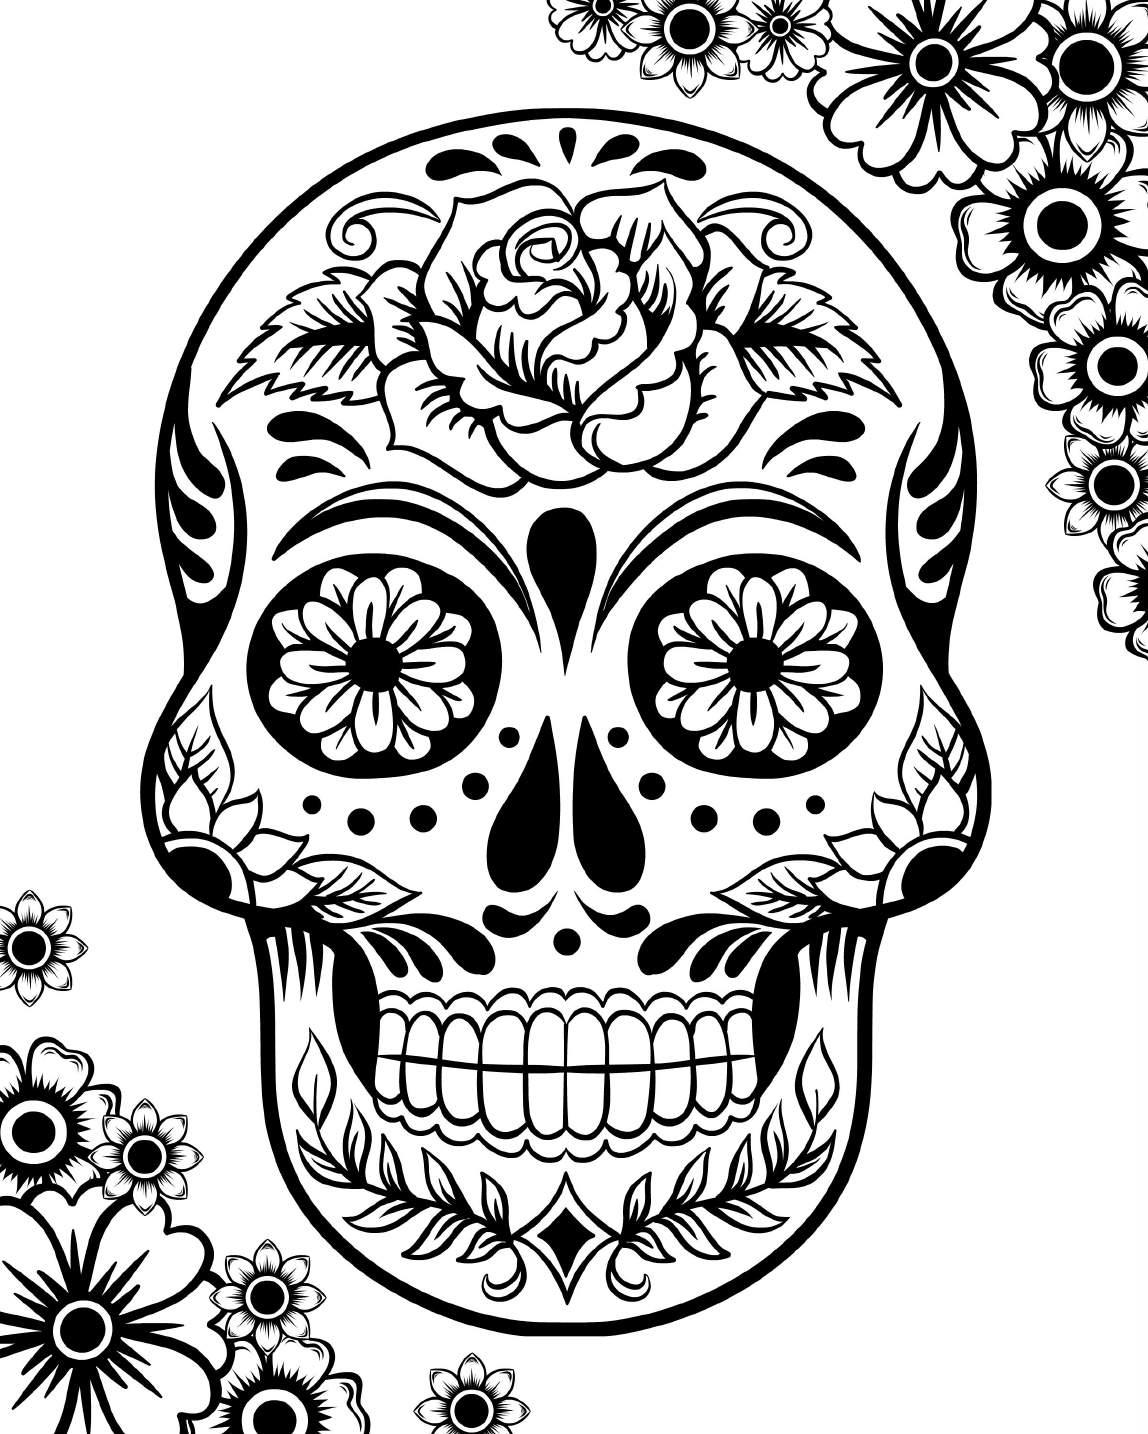 colored sugar skulls how to draw sugar skulls video art tutorial lucid publishing skulls sugar colored